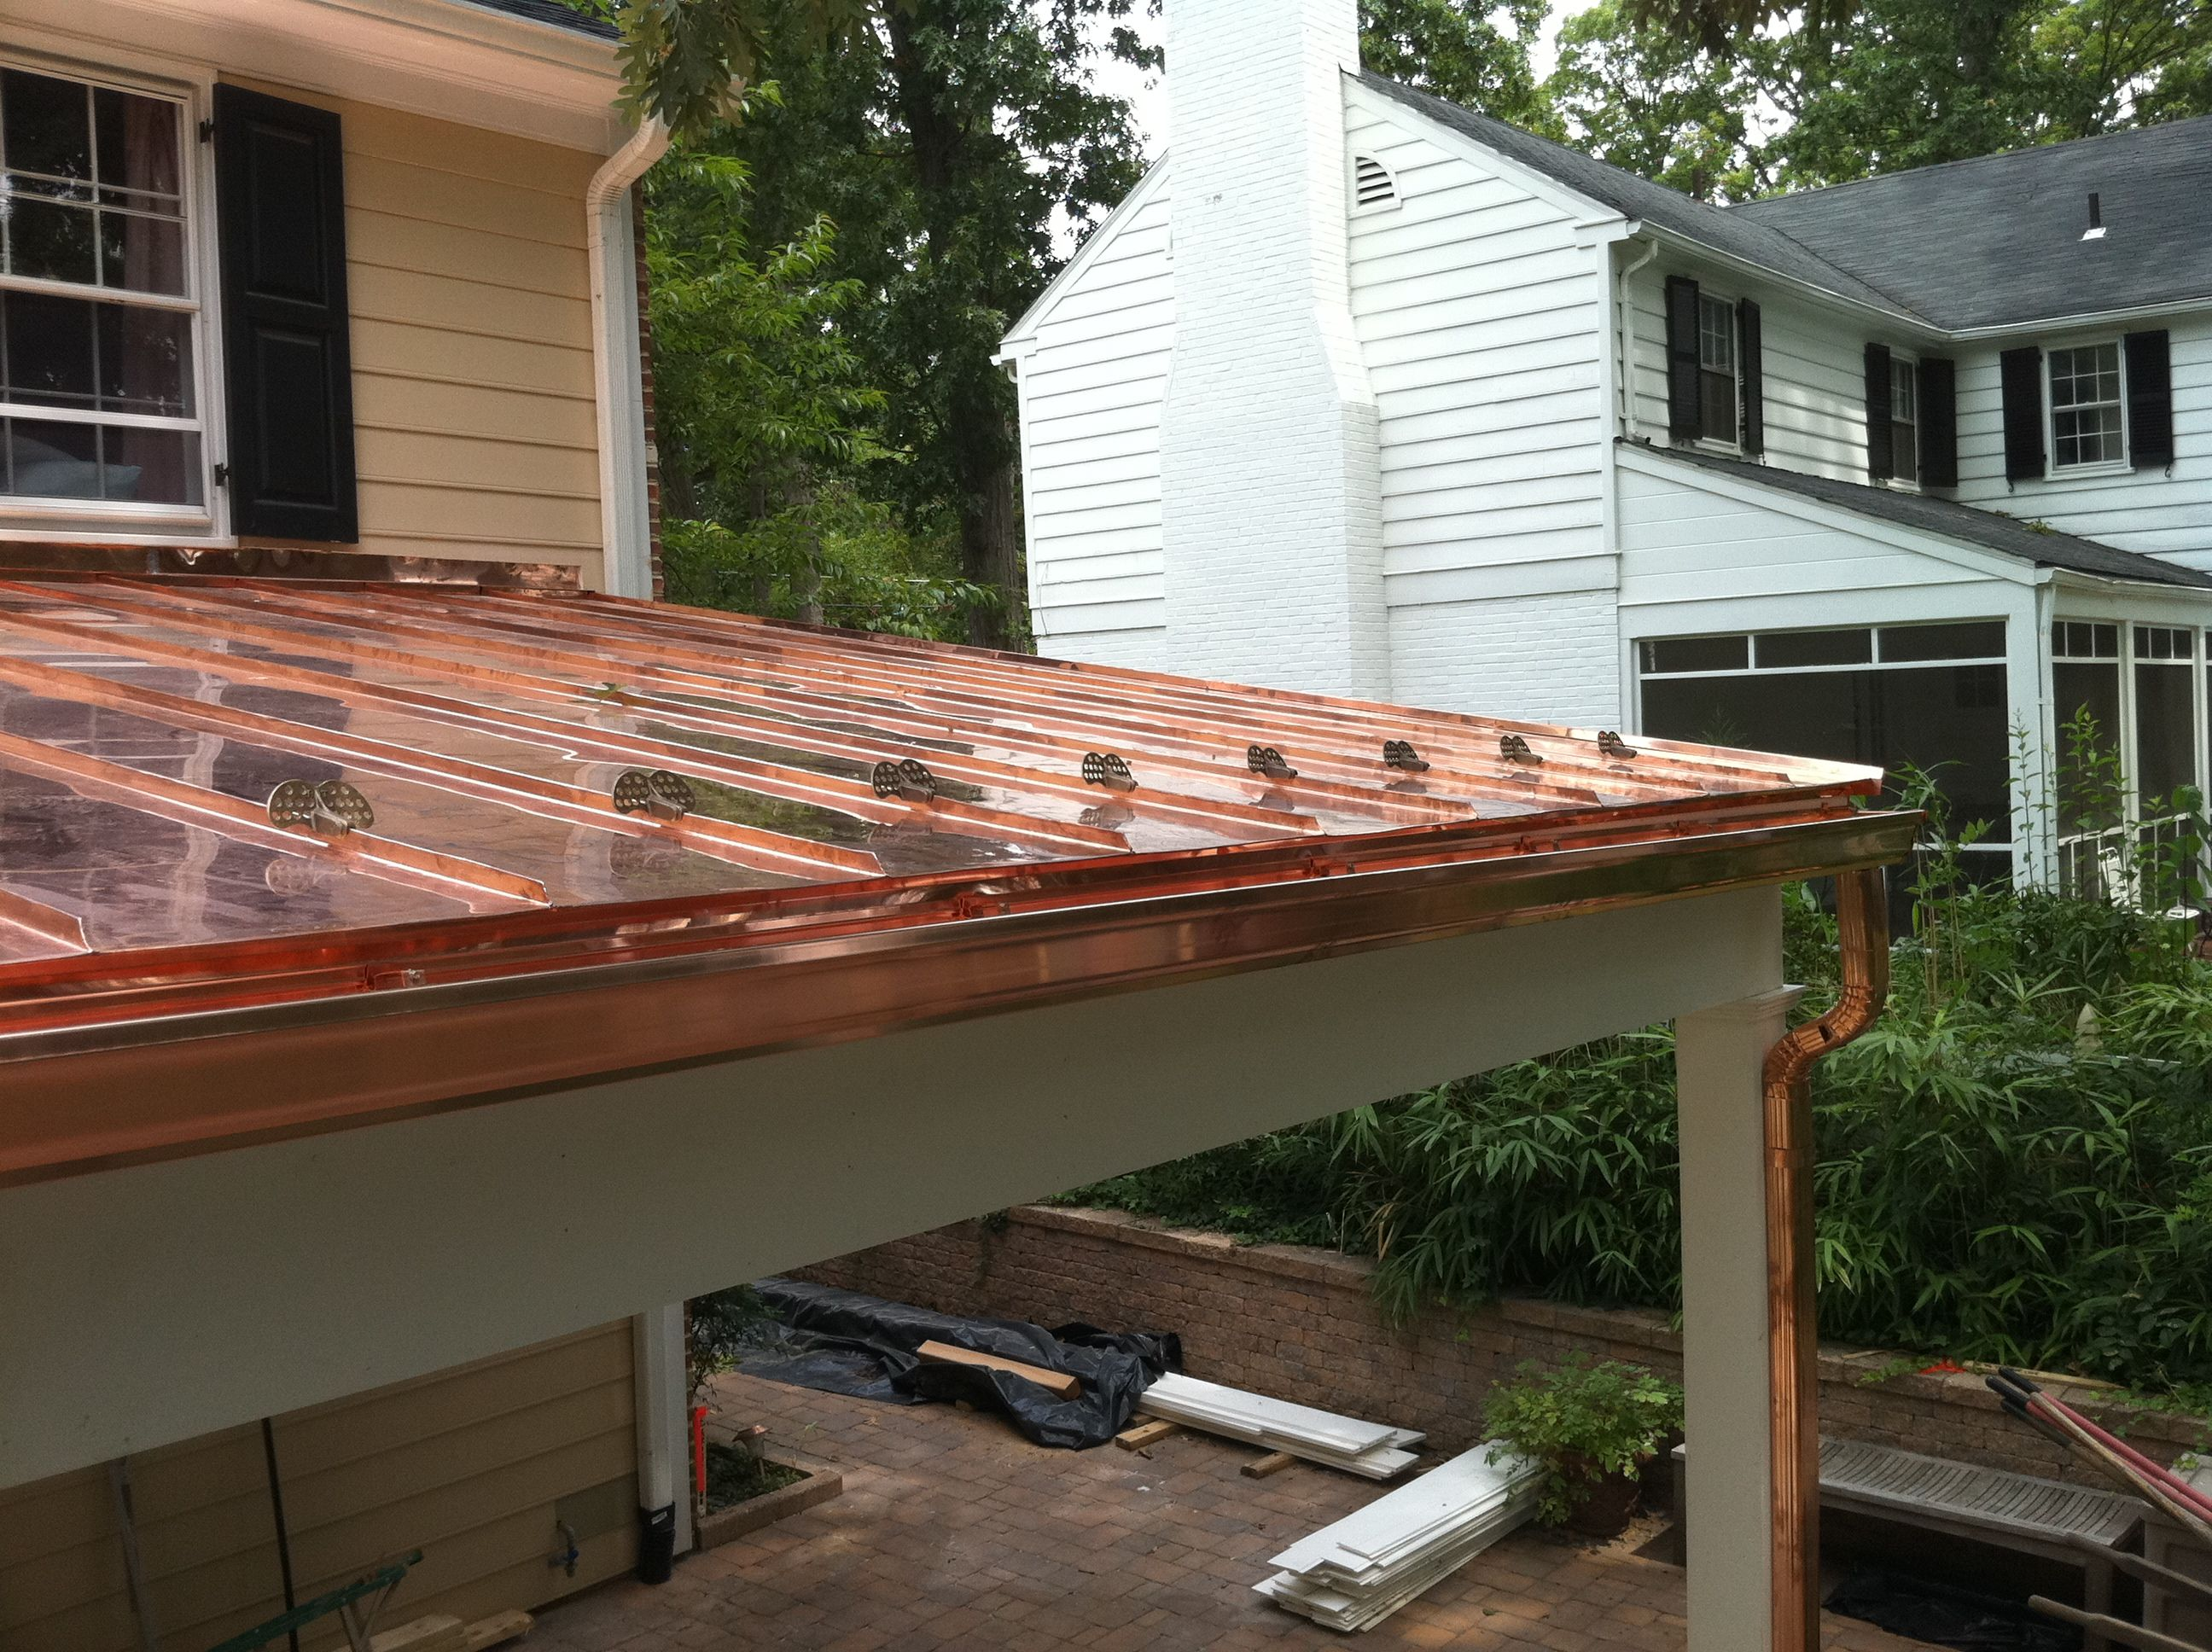 Standing Seam Copper Roof Alexandria Va Copper Roof Standing Seam Copper Roof Porch